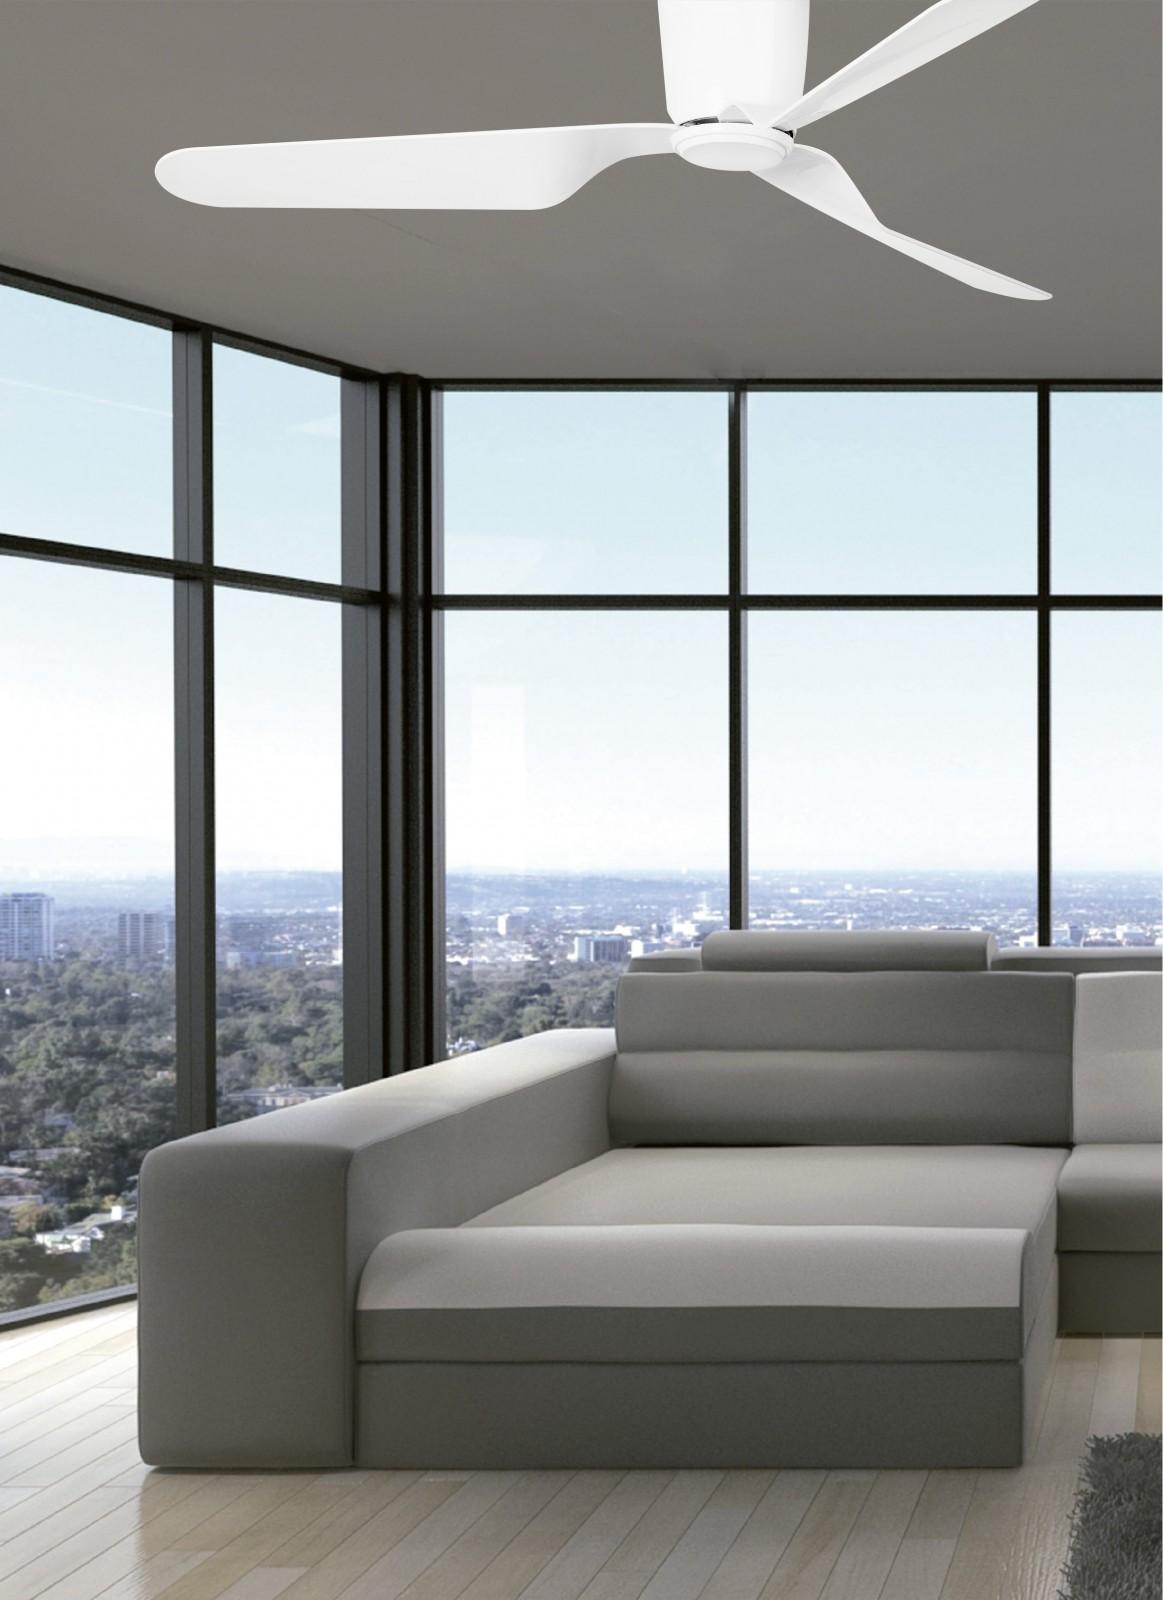 energiespar deckenventilator faro pemba wei 132 cm deckenventilator deckenventilatoren ohne. Black Bedroom Furniture Sets. Home Design Ideas